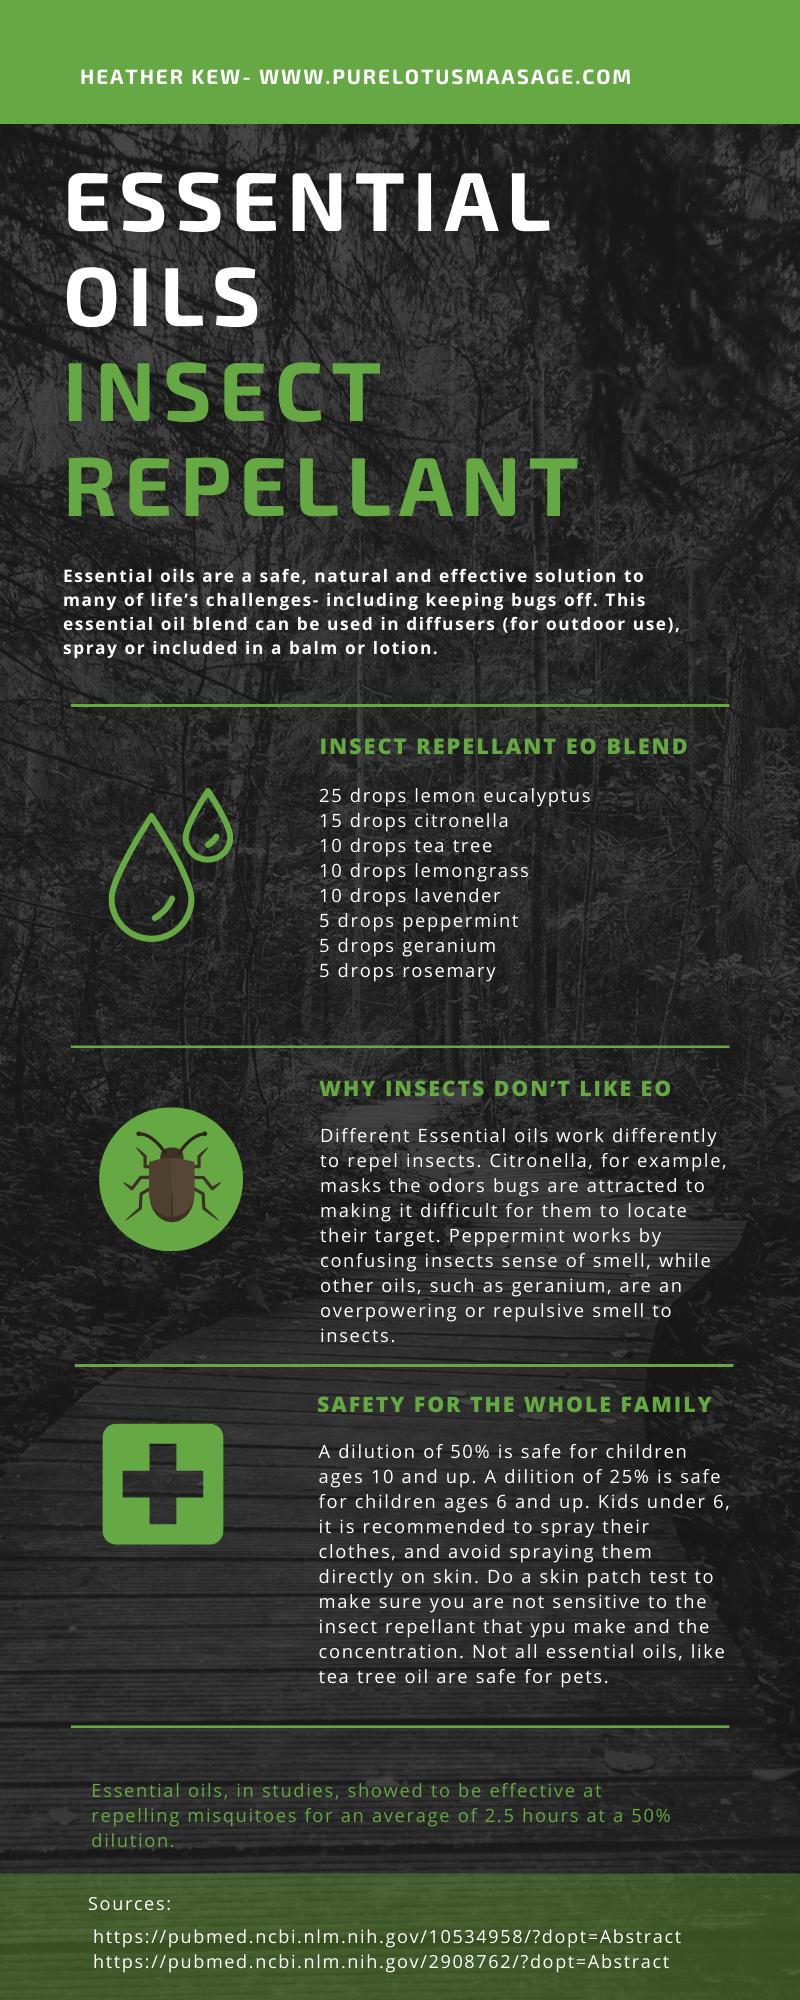 Essential oils insect Repellant